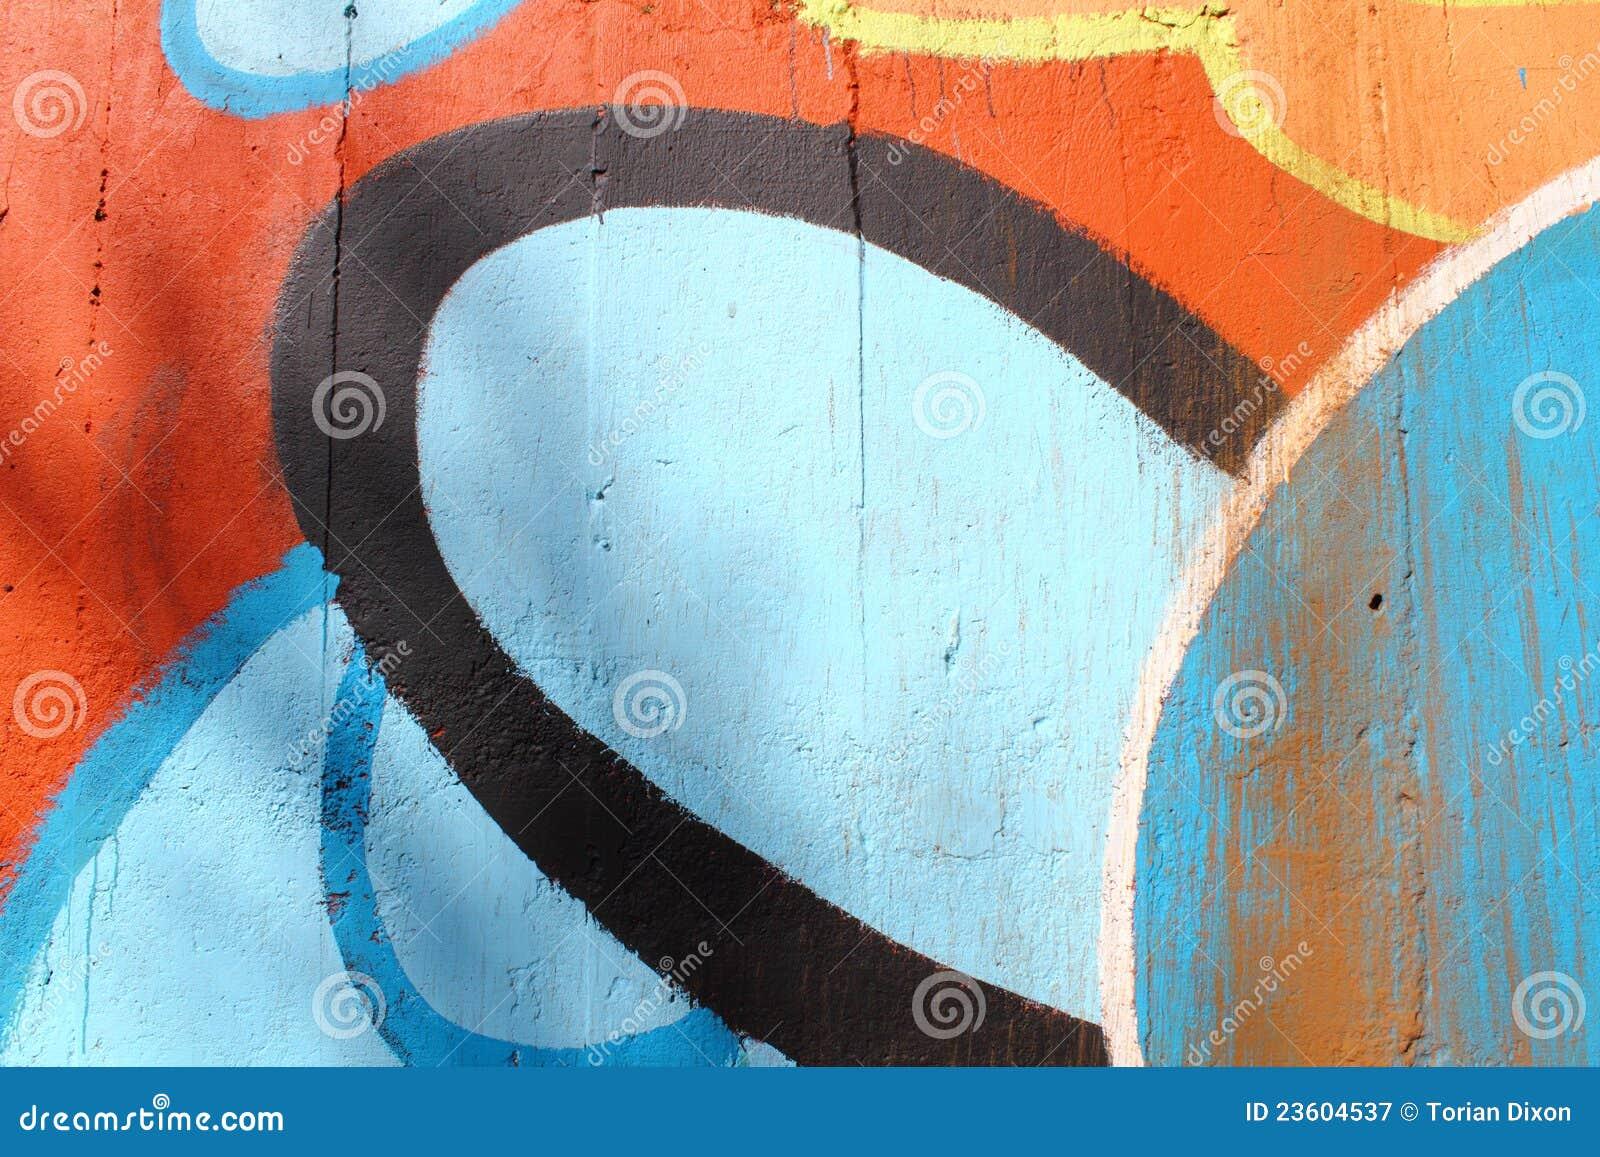 Cement Wall Graffiti : Graffiti painted concrete wall royalty free stock